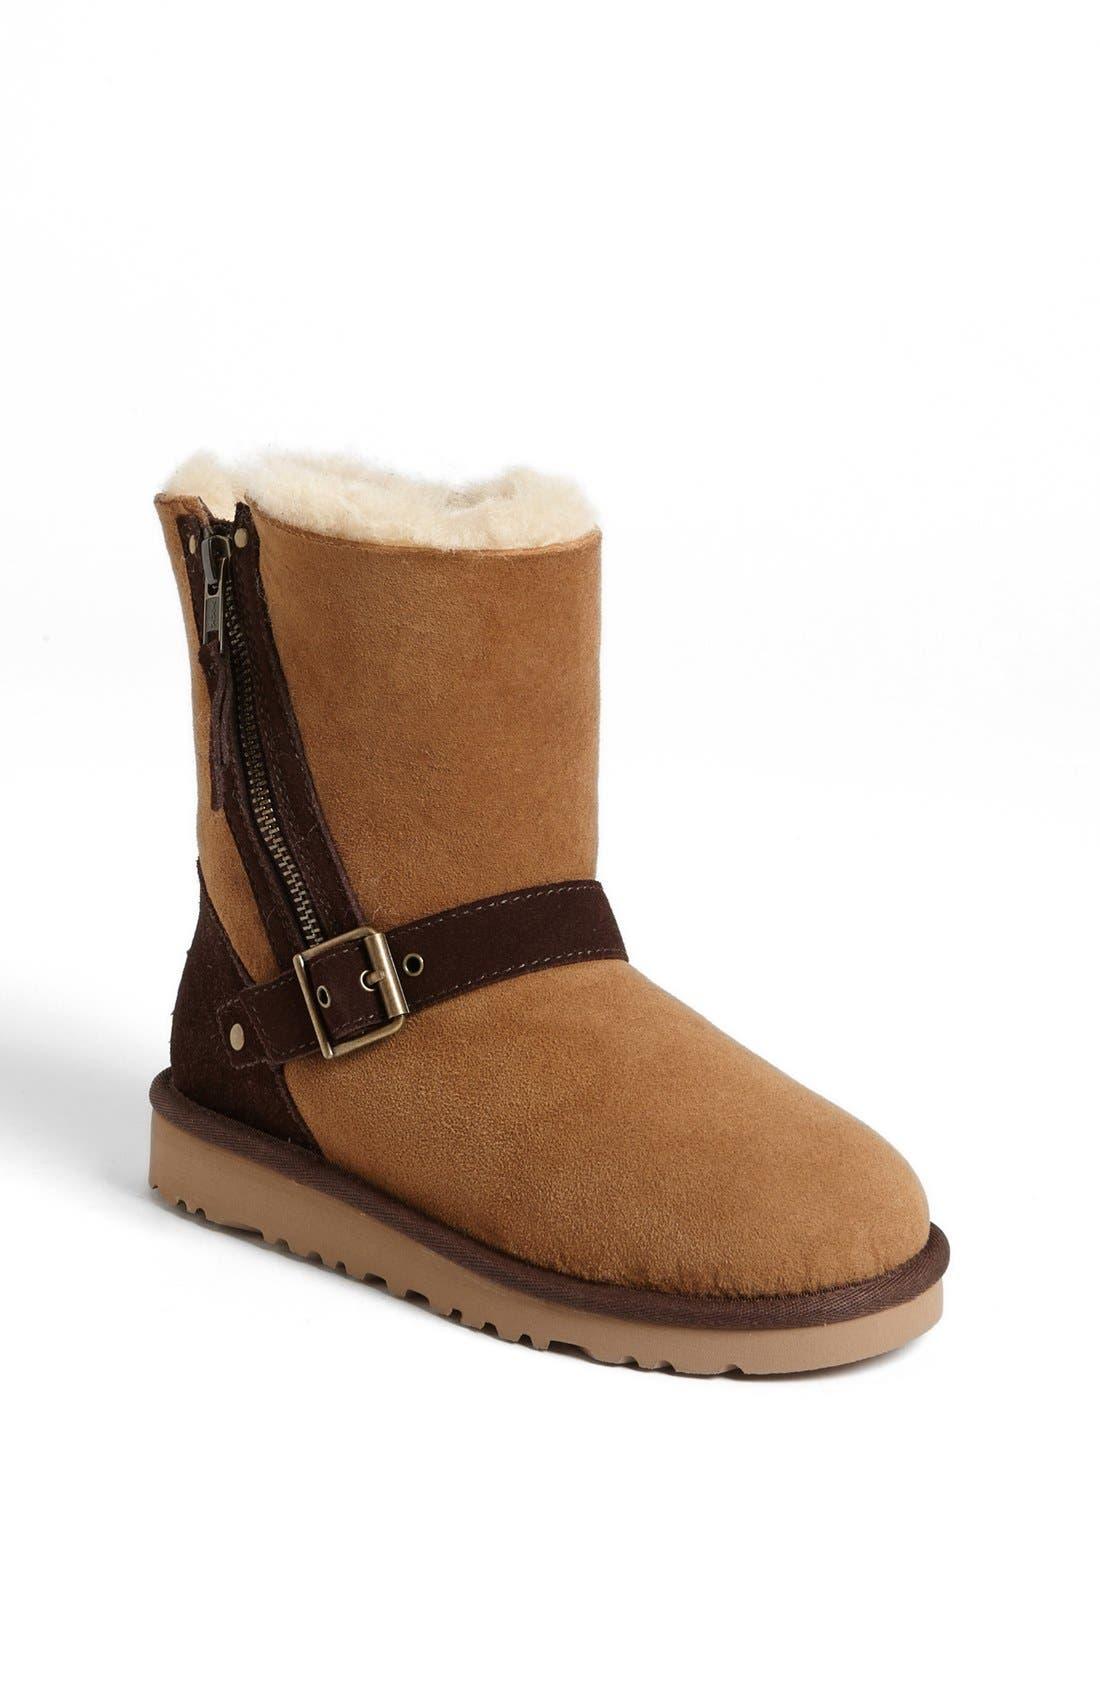 Main Image - UGG® Australia 'Blaise' Boot (Toddler, Little Kid & Big Kid)